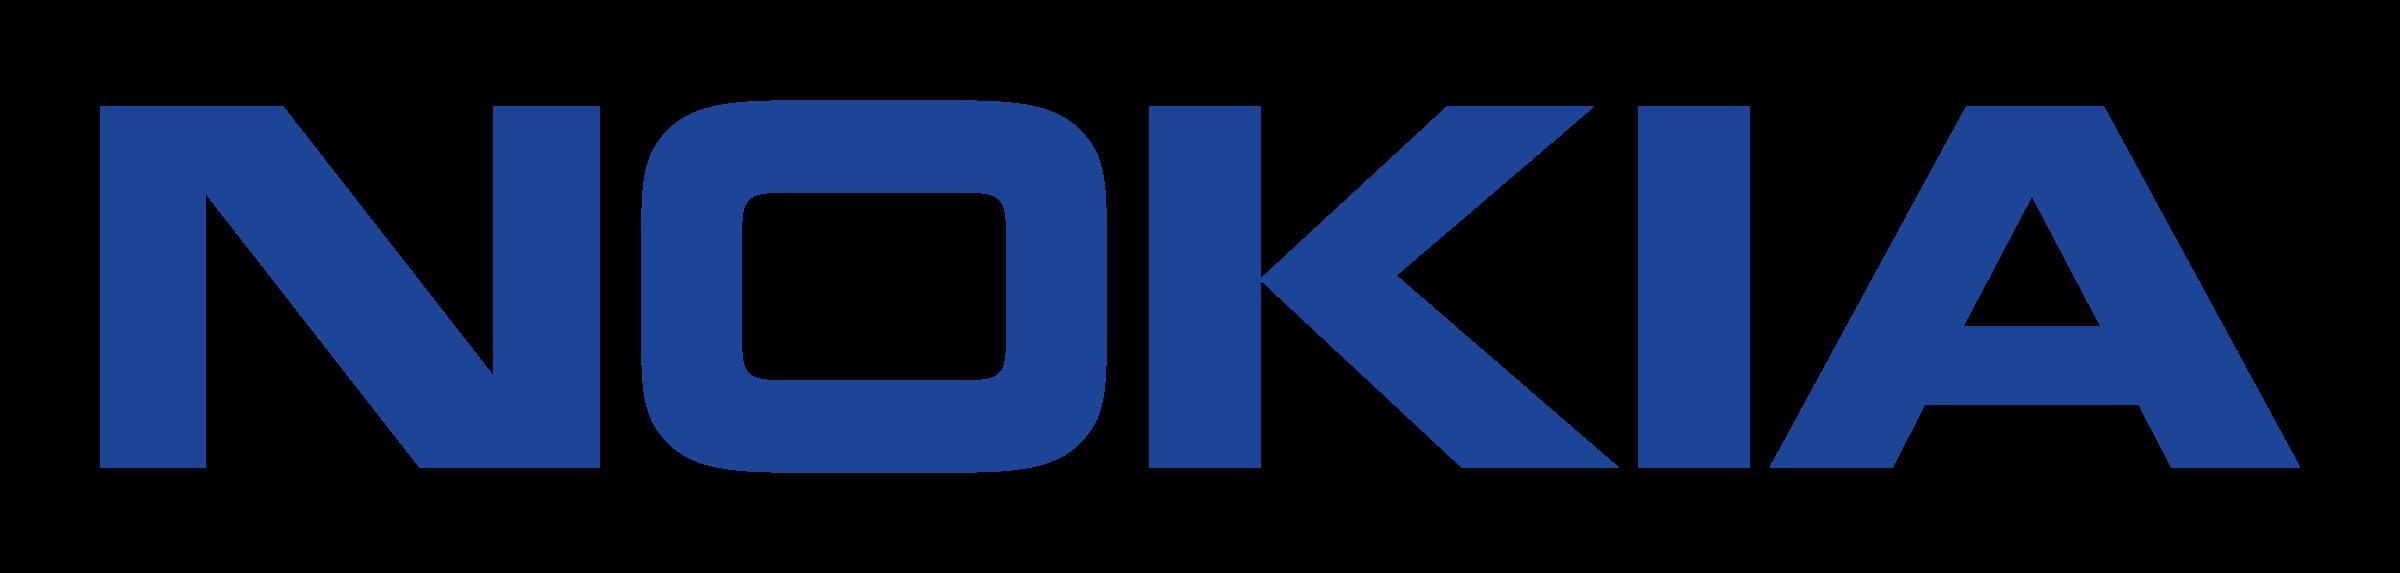 https://www.appscale.com/wp-content/uploads/2020/11/nokia-logo-png-transparent.png